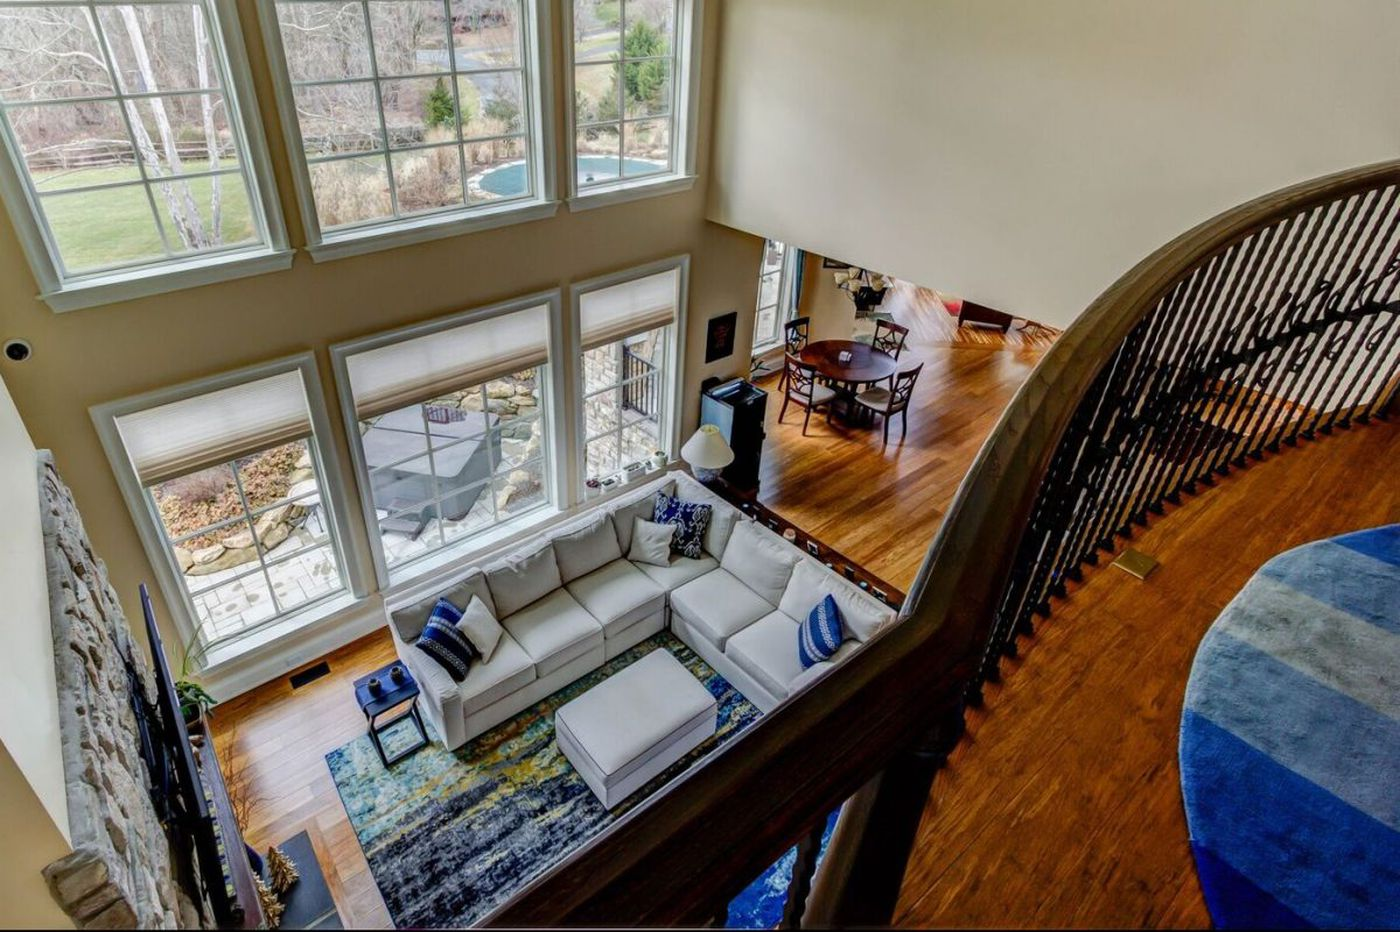 On the Market: 5-bedroom Delaware dream home for $1.9M